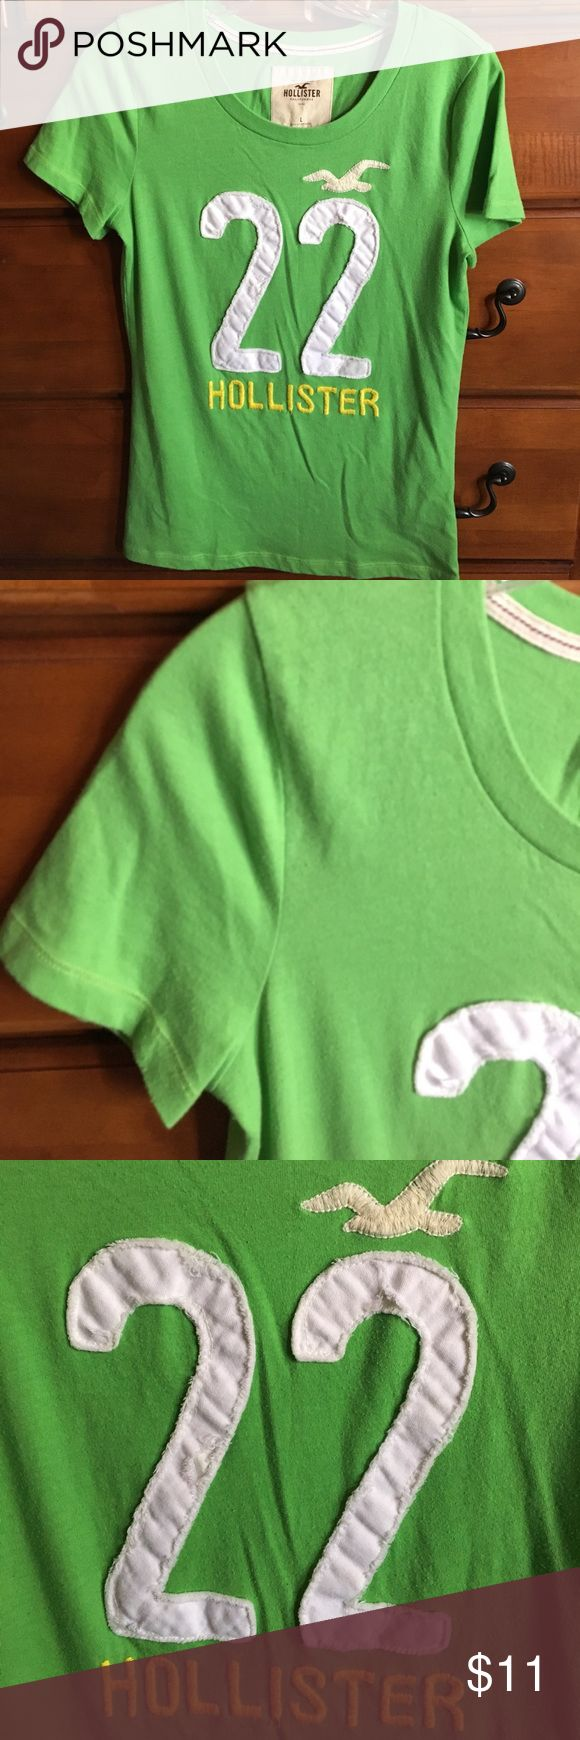 Neon Green Hollister Shirt Super cute..summer ready..put on favorite shorts & converse or sandals!! Hollister Tops Tees - Short Sleeve